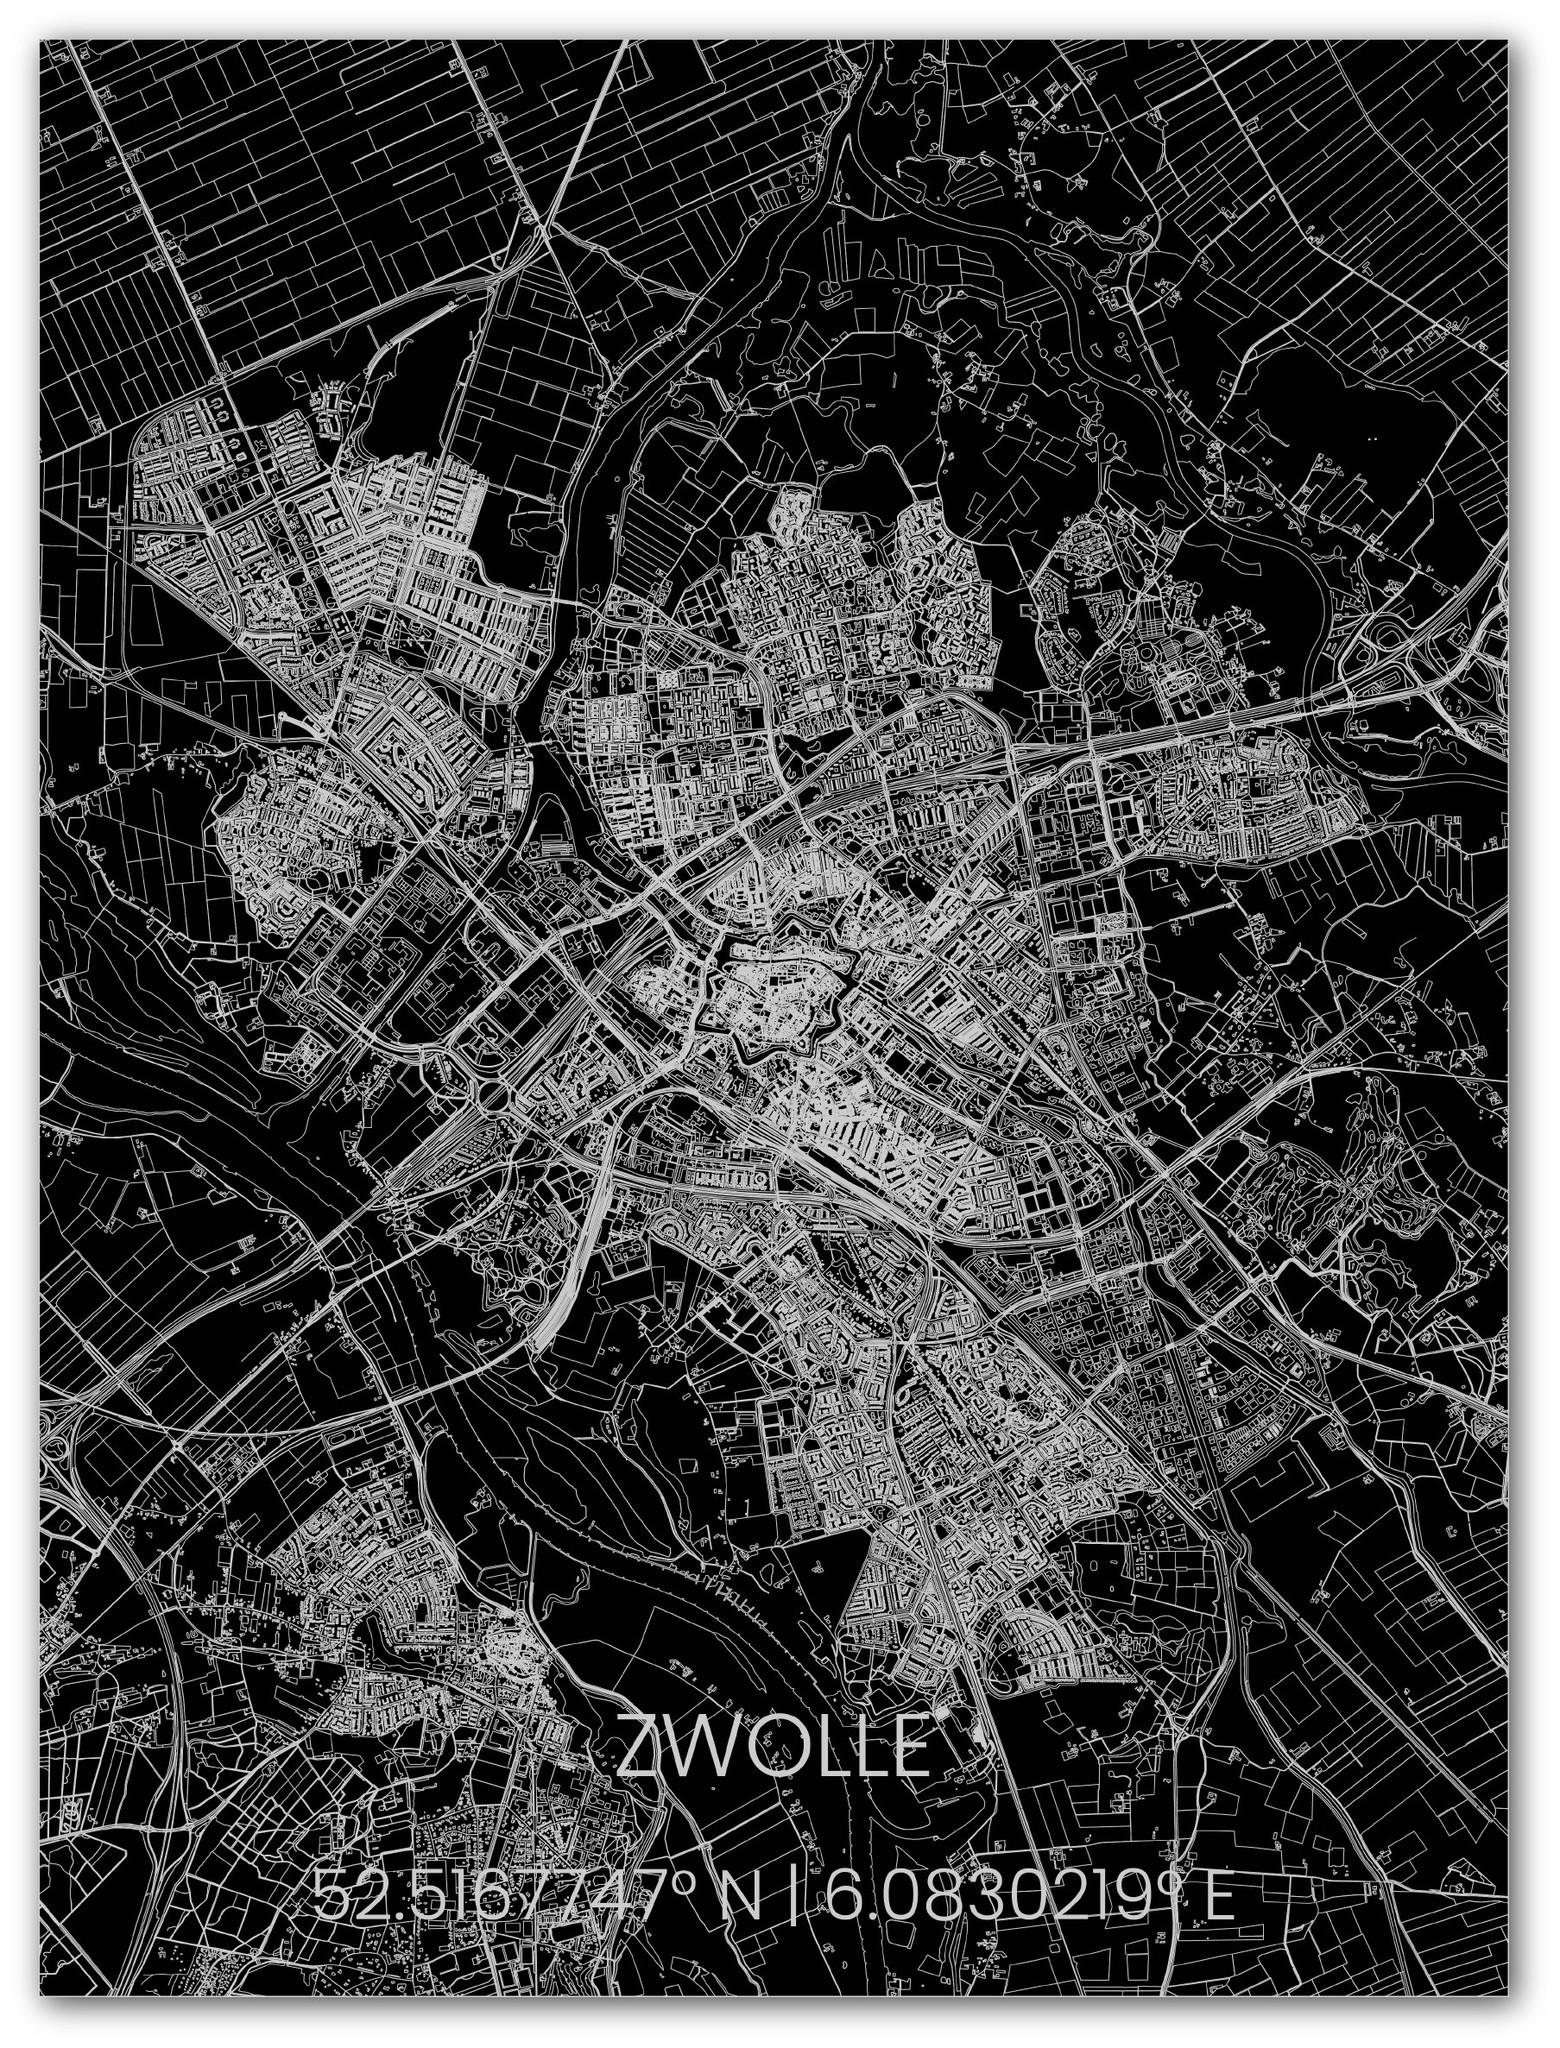 Metalen stadsplattegrond Zwolle-1